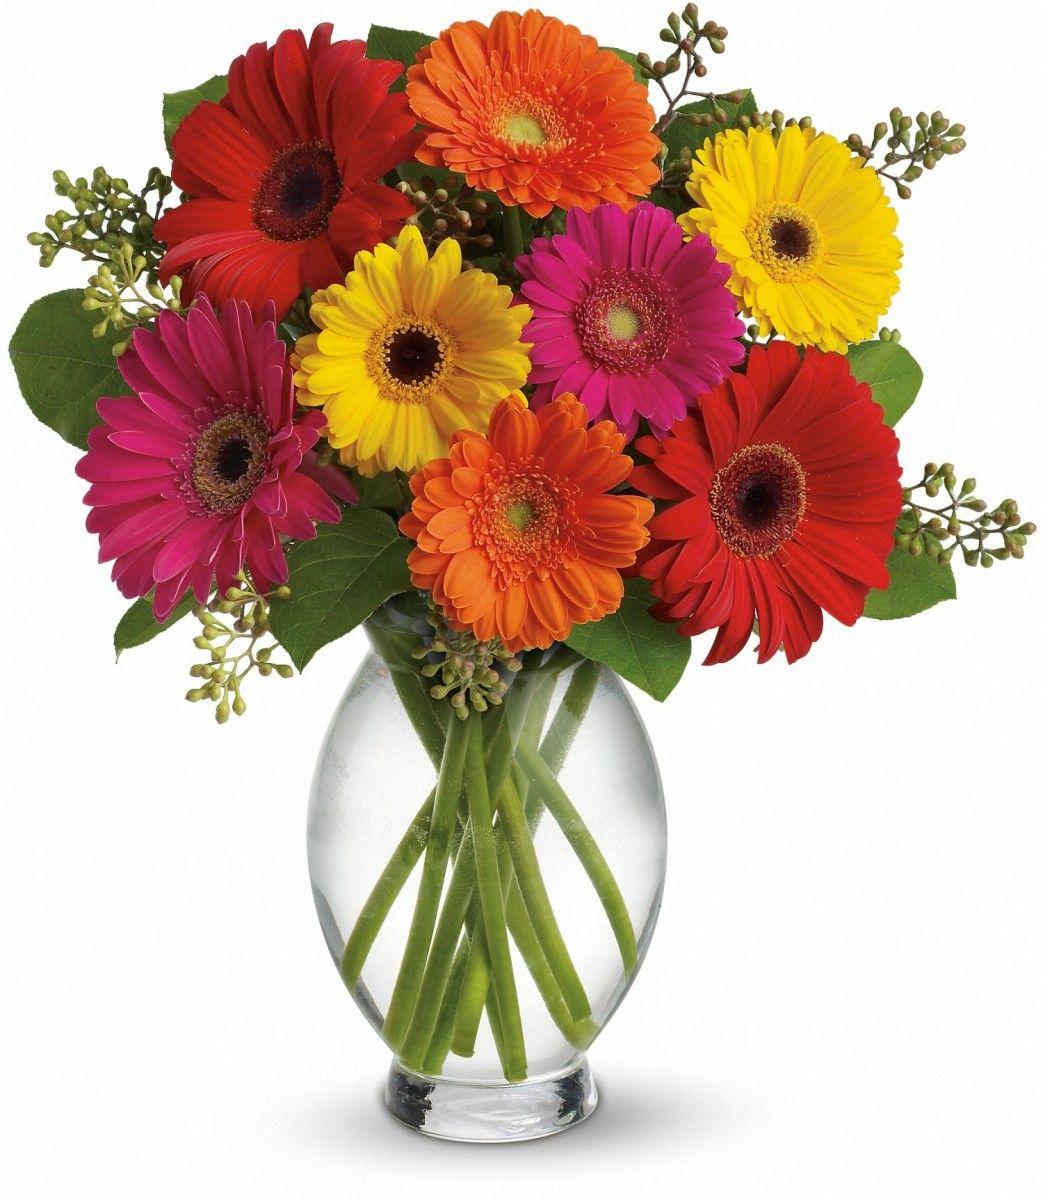 Gerbera Daisy Arrangements Vases: Pin By FlowerAura On Floweraura Chennai